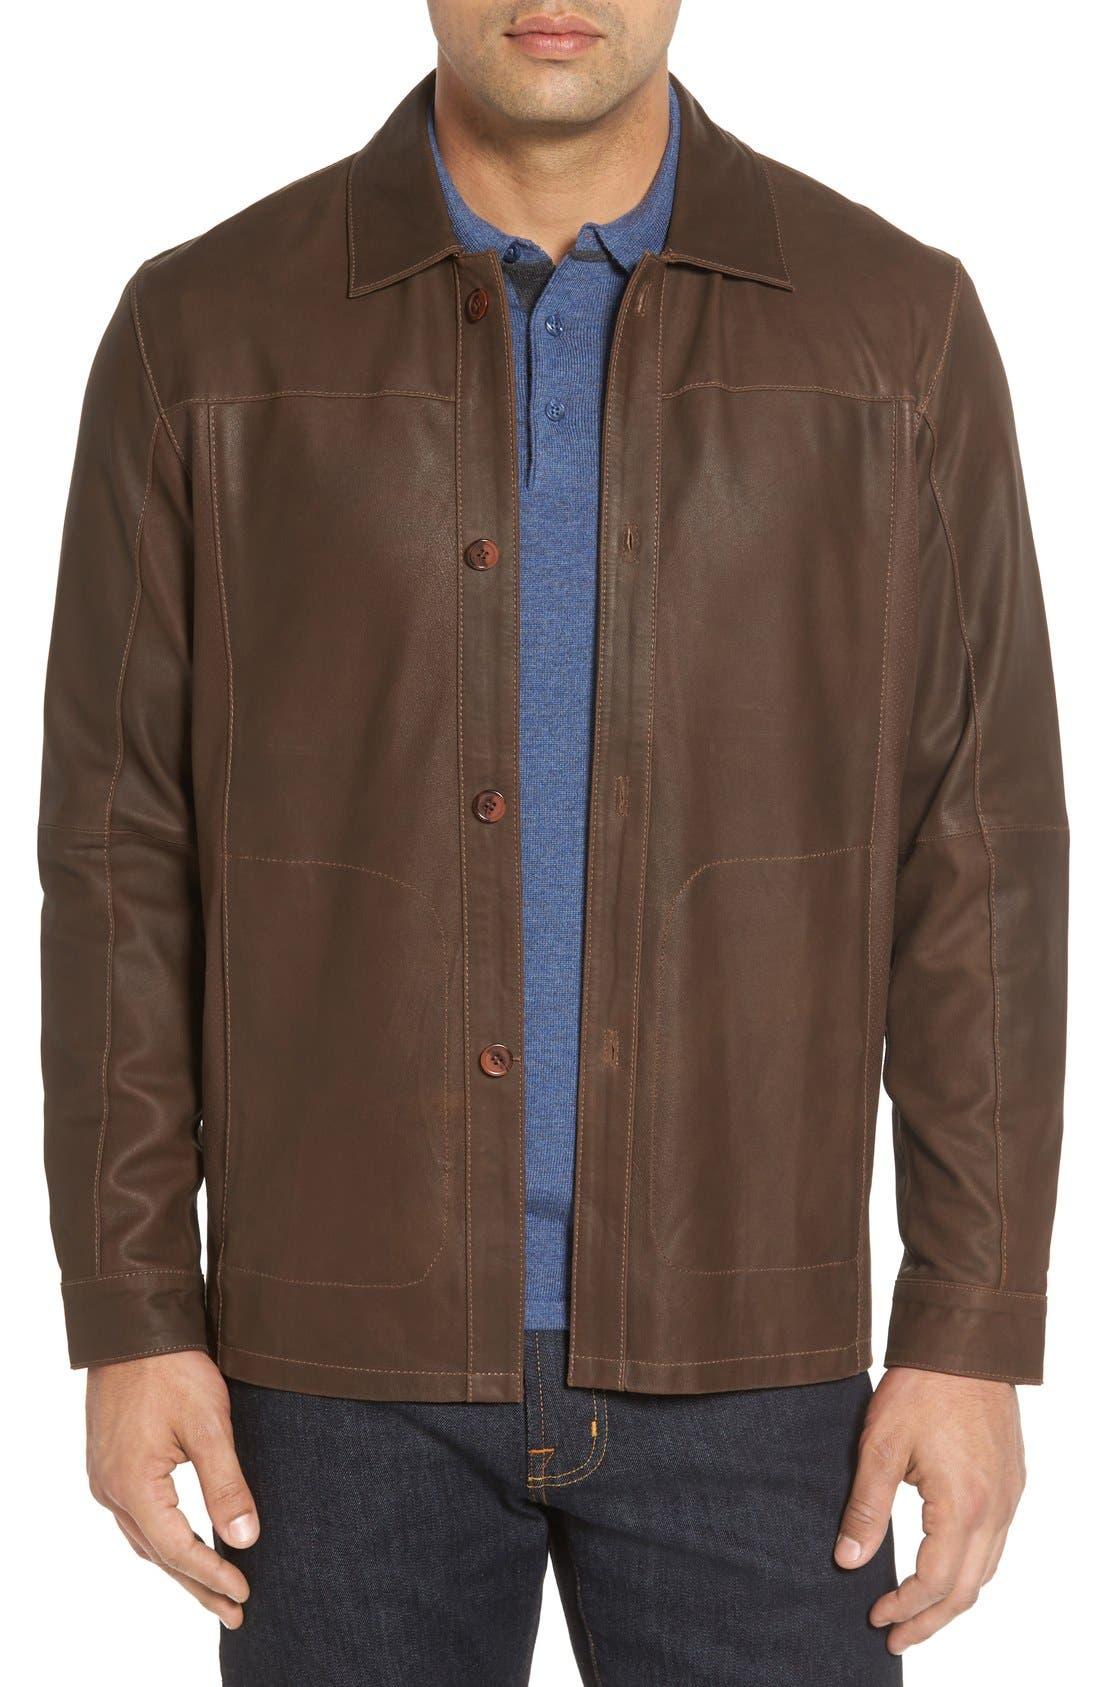 Main Image - Missani Le Collezioni Unlined Leather Jacket